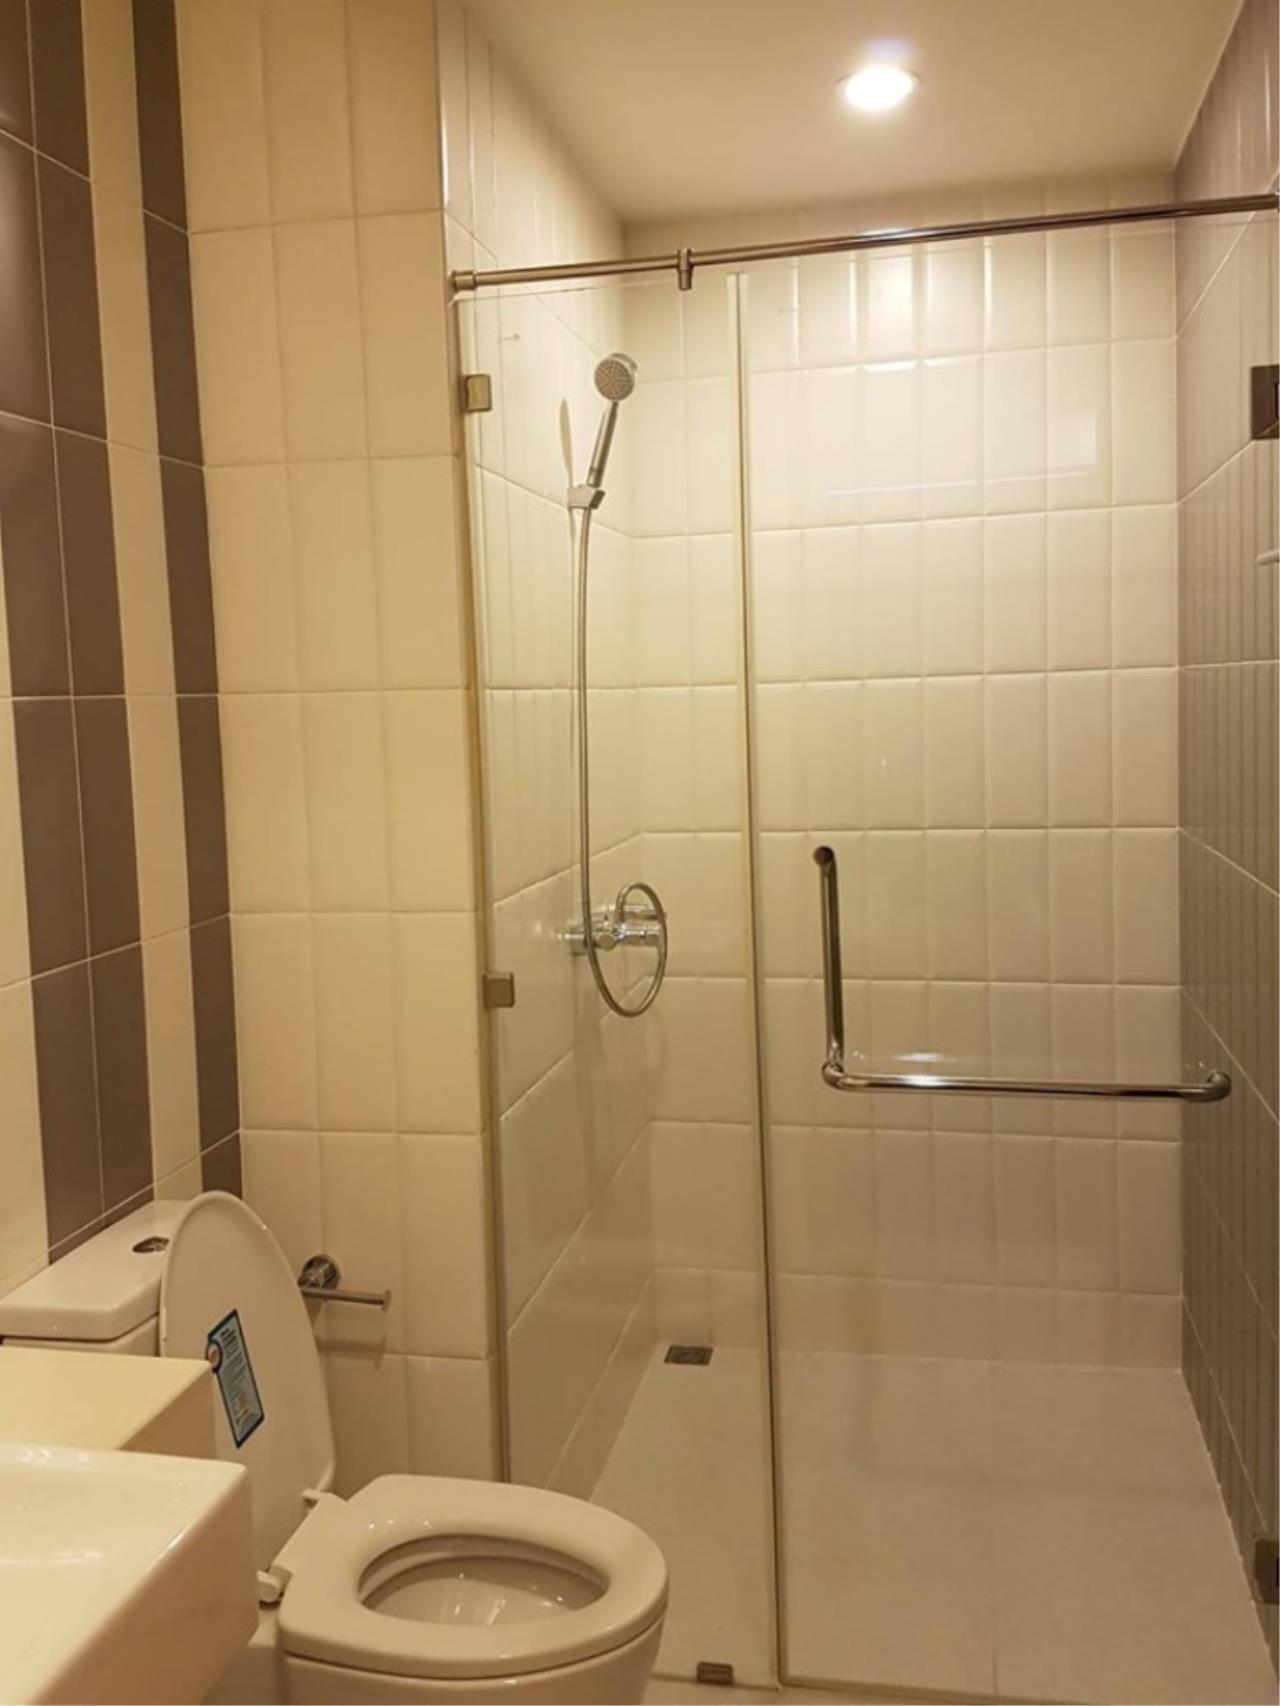 Century21 Skylux Agency's Circle Condominium / Condo For Rent / 1 Bedroom / 45 SQM / BTS Nana / Bangkok 9